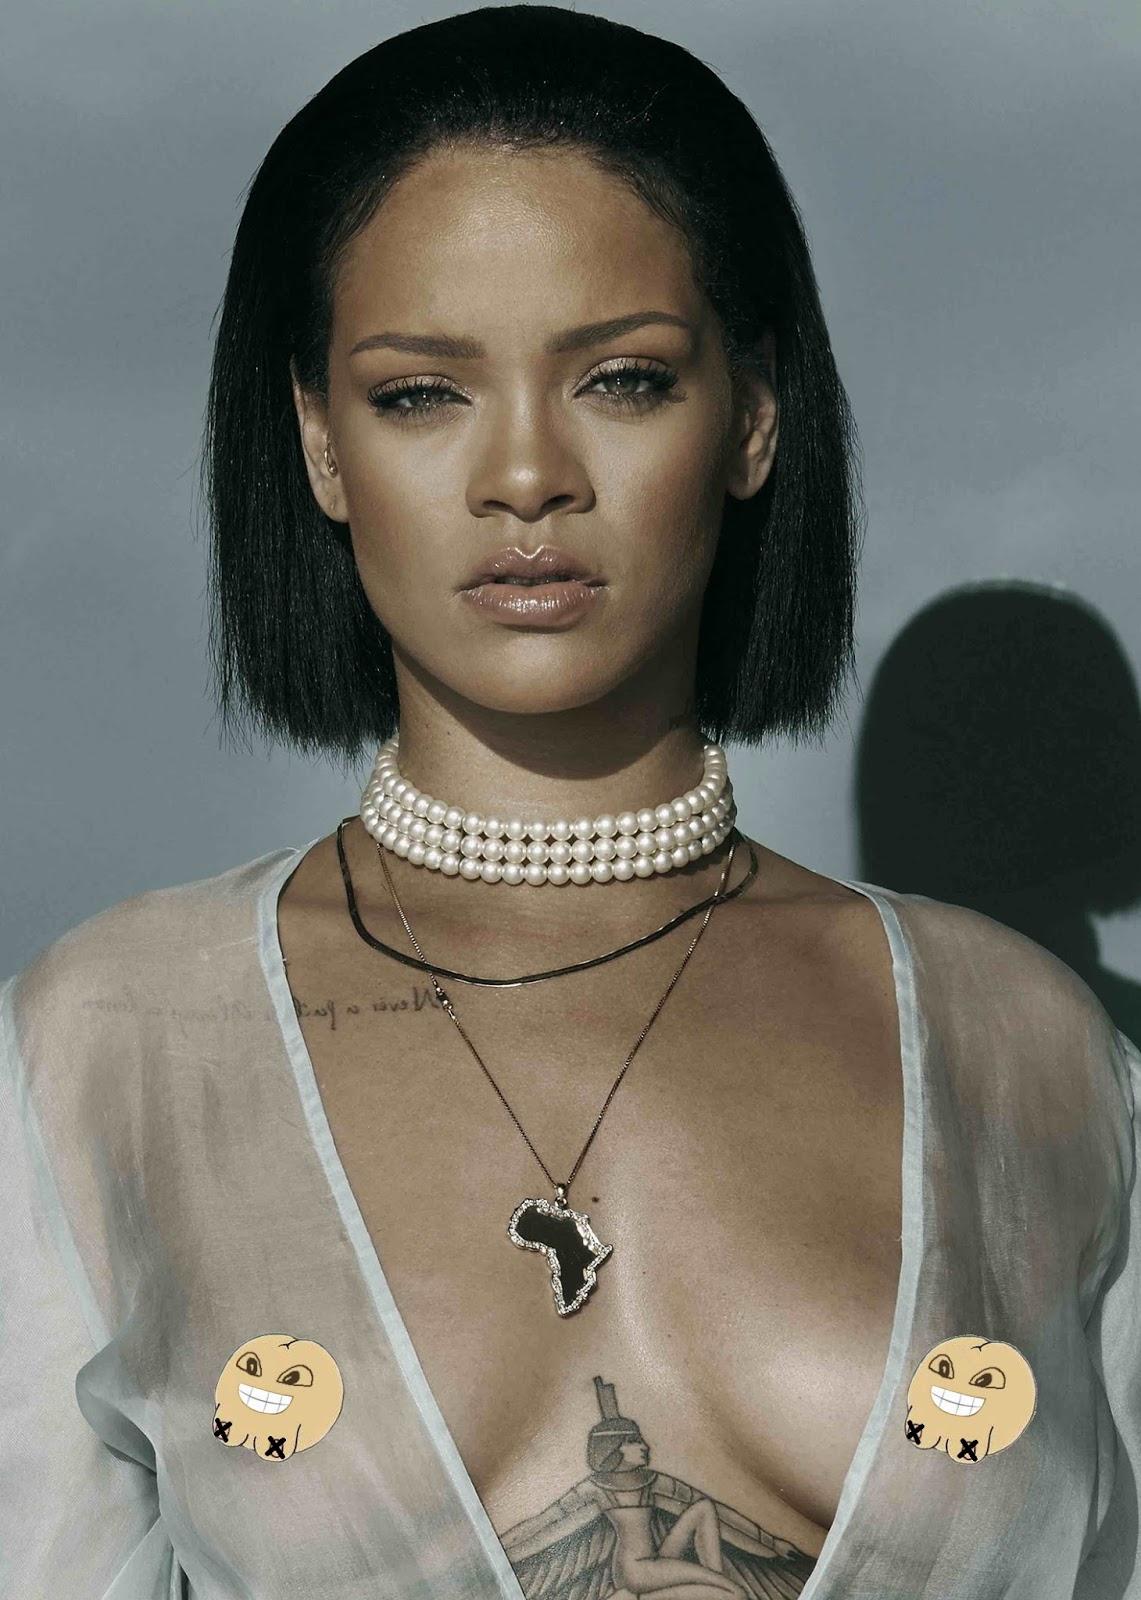 Rihanna Apologises To Muslim Community After Using Islamic Hadith